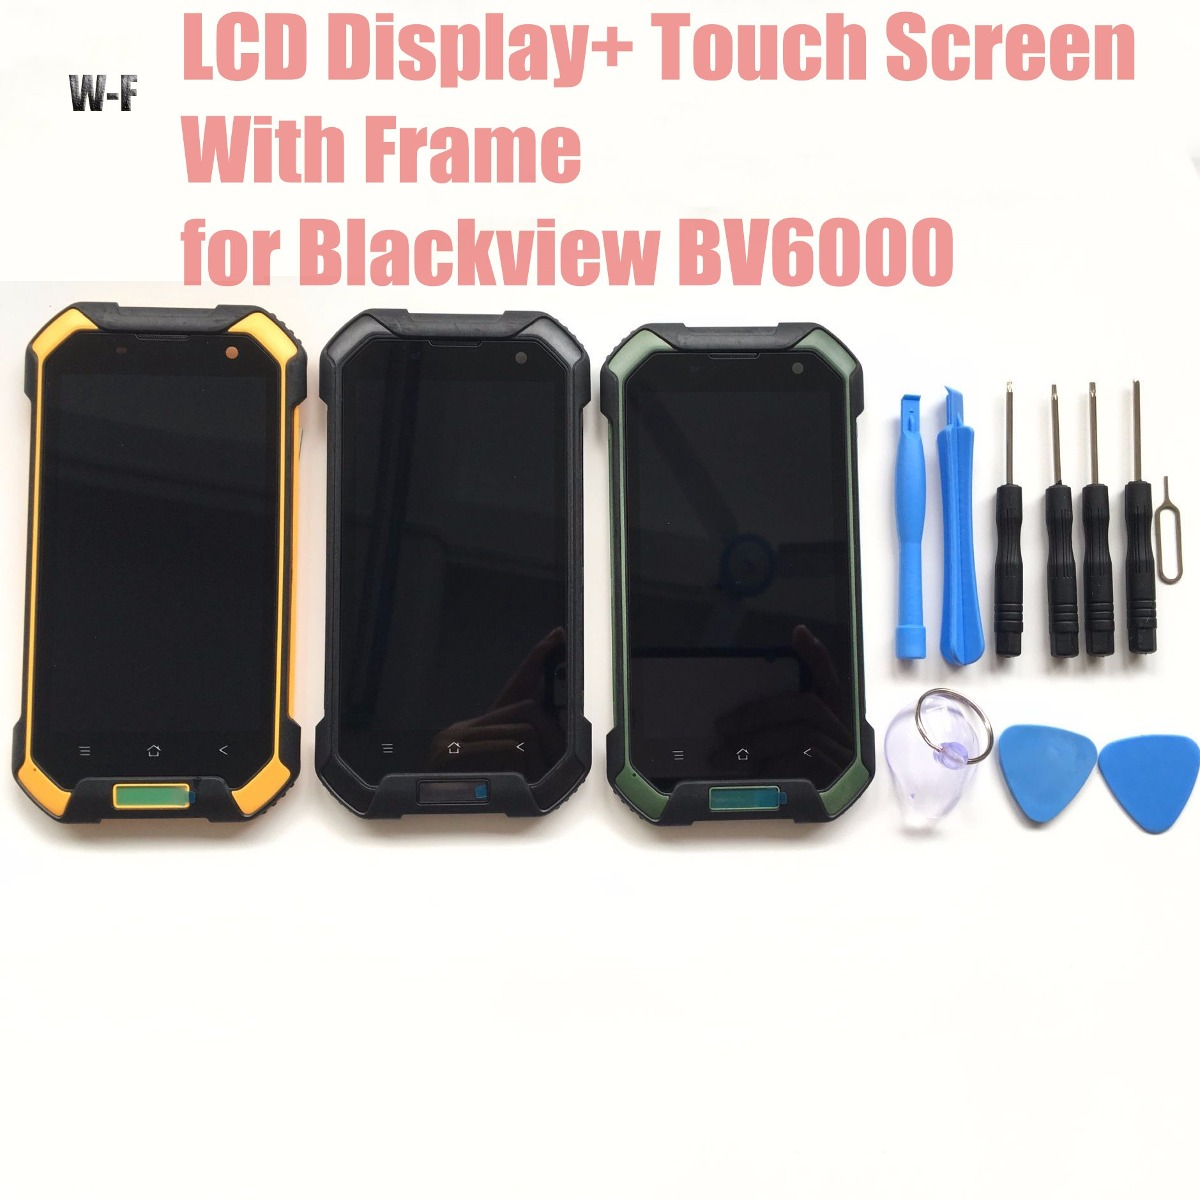 Promo Harga Blackview 6000 Terbaru 2018 Hp Bv6000 4g Lte Waterproofbv 3gb 32gb 13mp Display Lcd Tela Touch R 21999 Em Mercado Livre Carregando Zoom